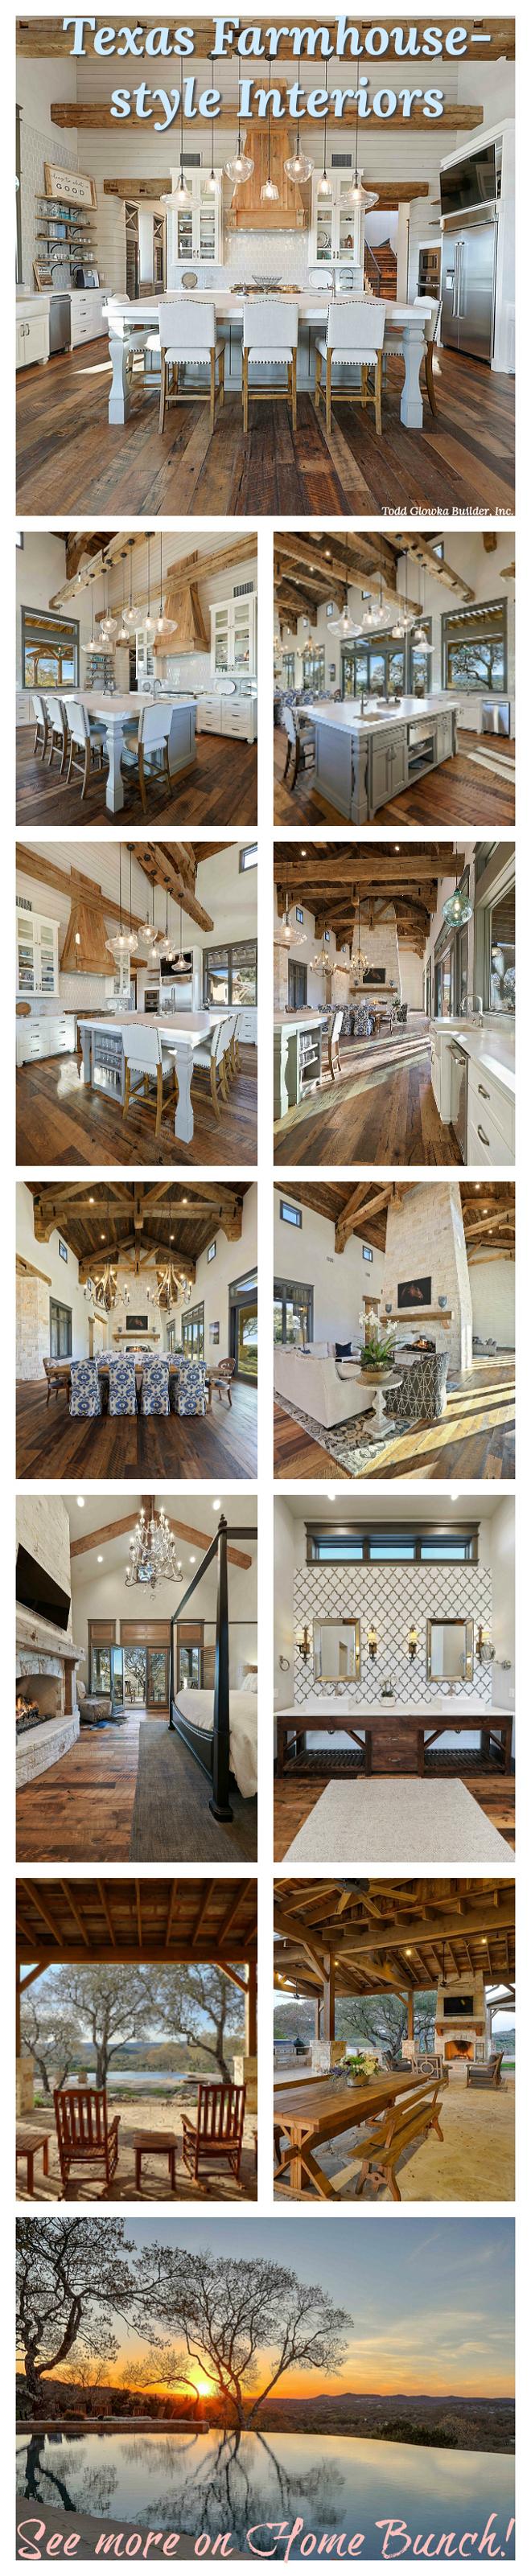 Interior Design Ideas Texas Farmhouse-style Interiors Interior Design Ideas Texas Farmhouse-style Interior Pictures #InteriorDesignIdeas #Texas #Farmhouse #farmhousestyle #farmhouseInteriors